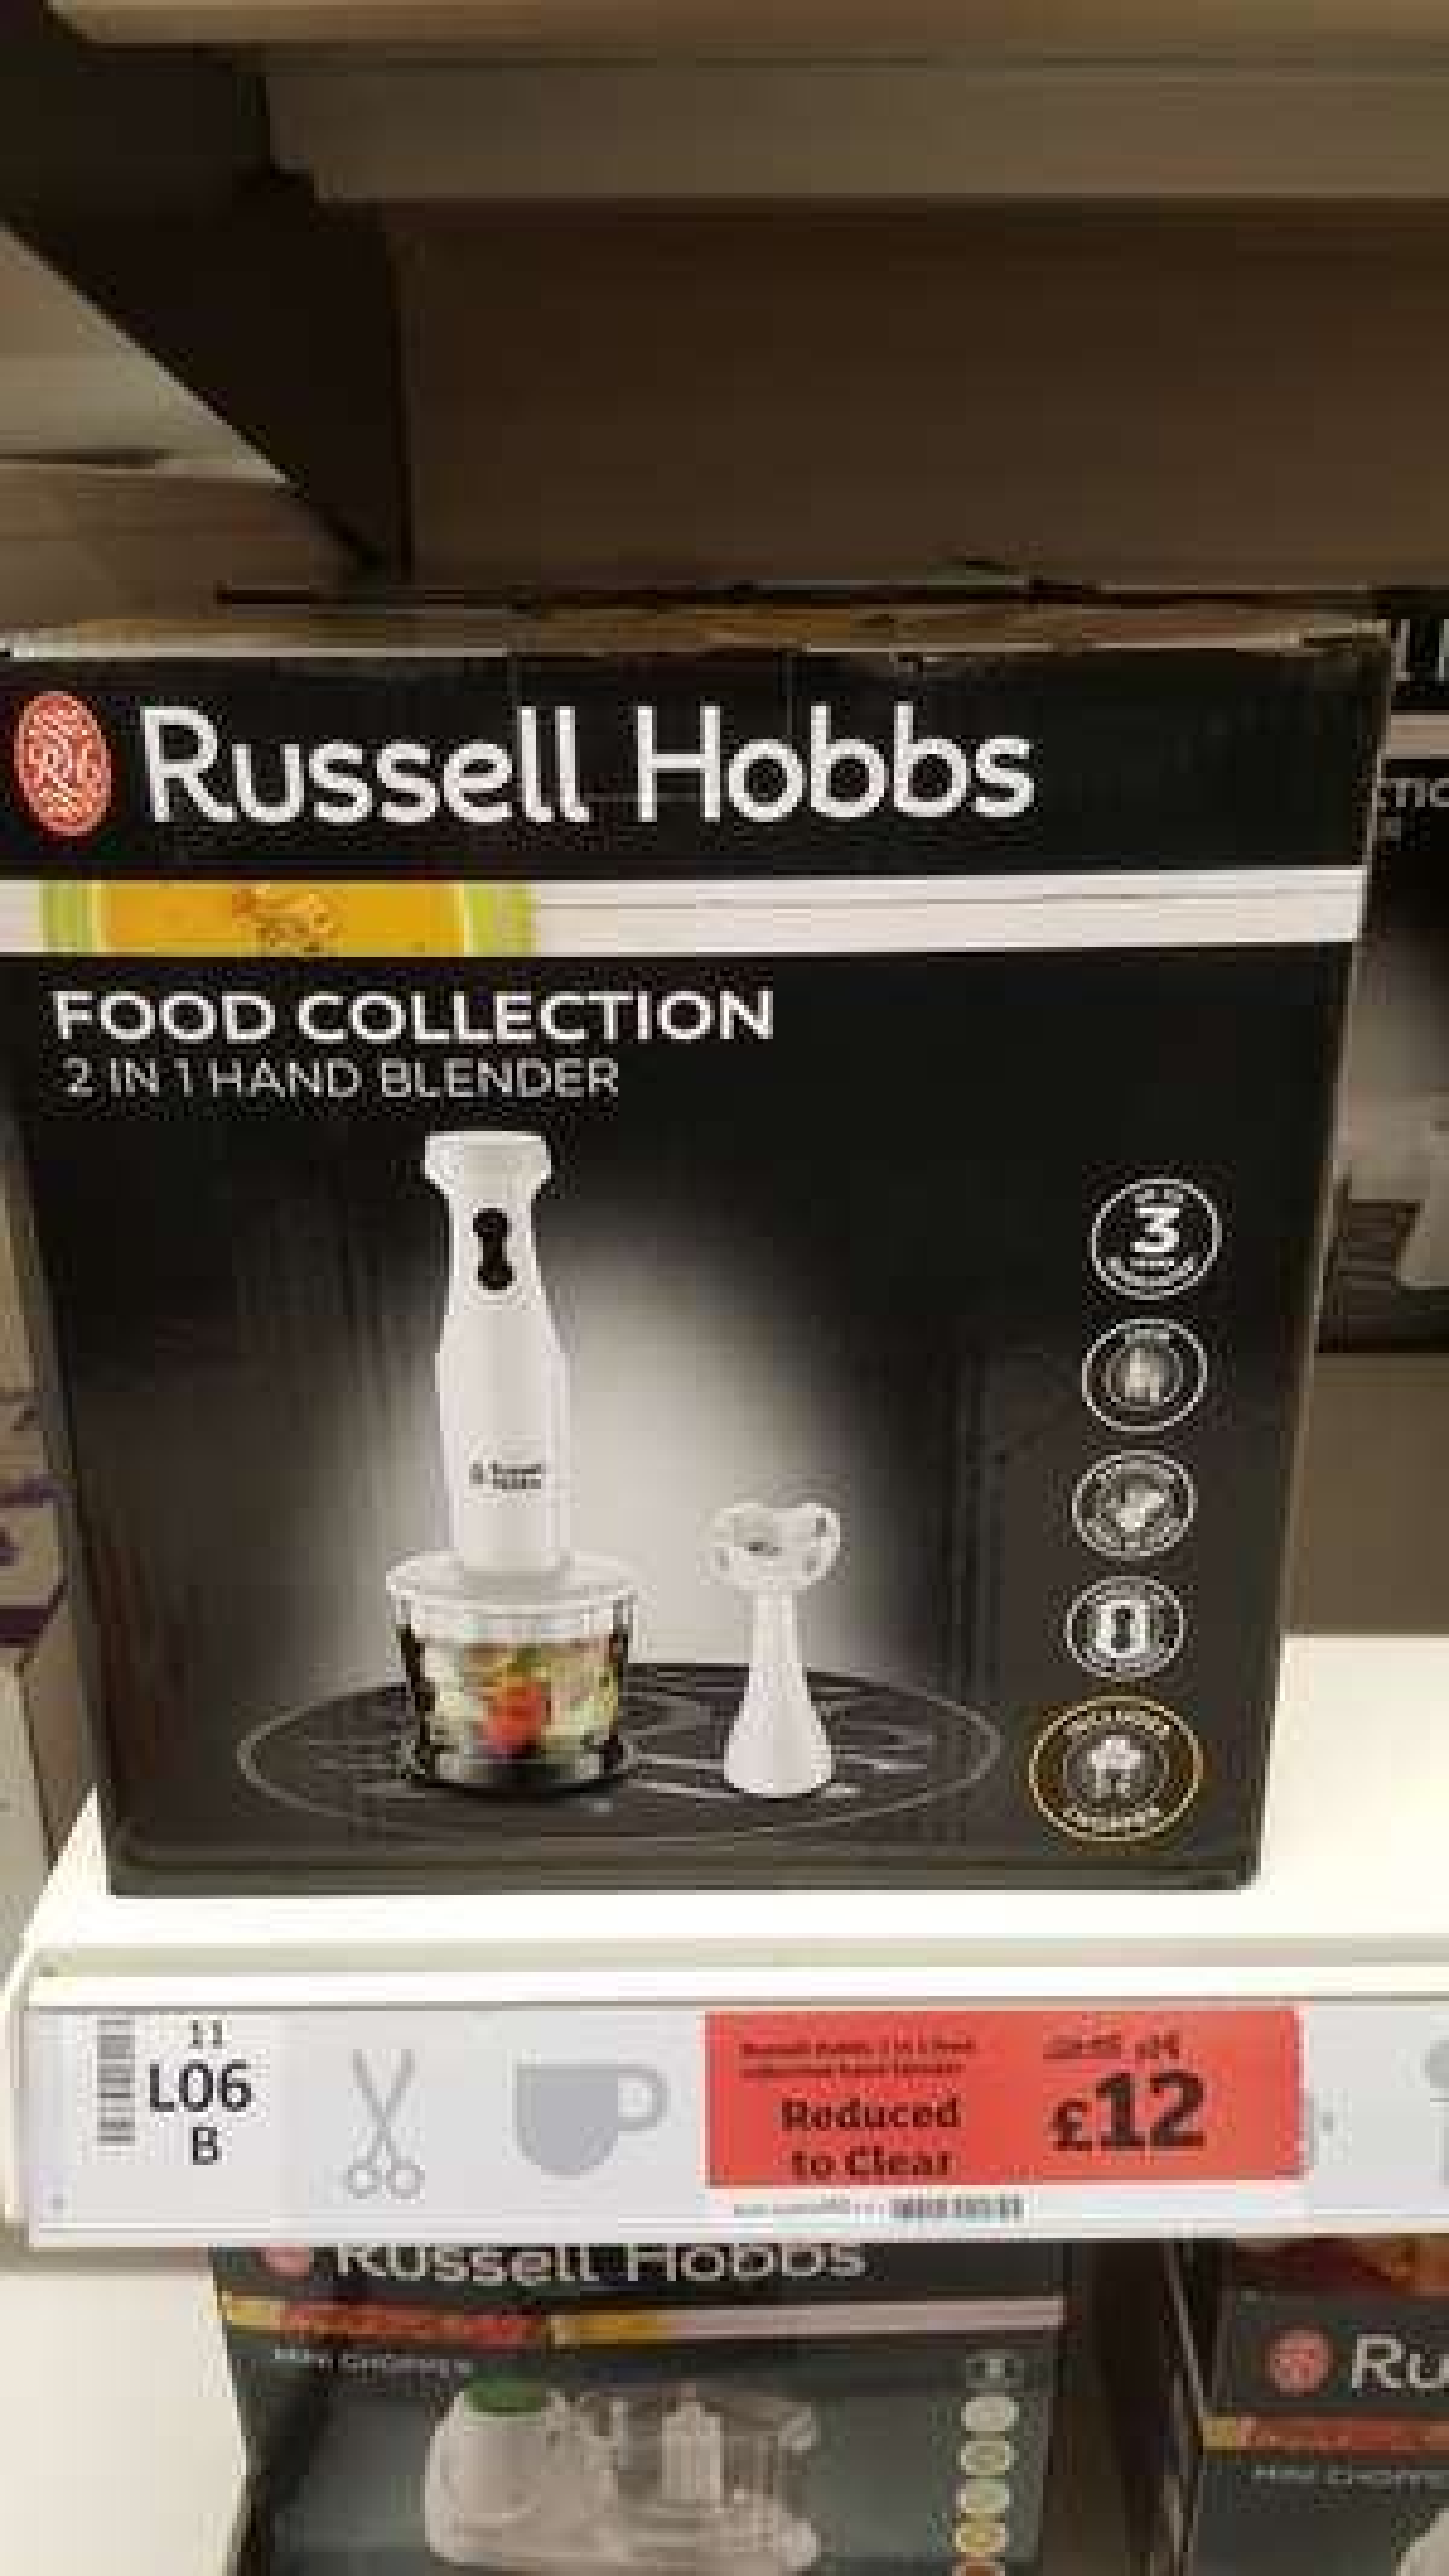 Russell Hobbs 2 in 1 Hand Blender & Chopper £12 @ Sainsbury's instore